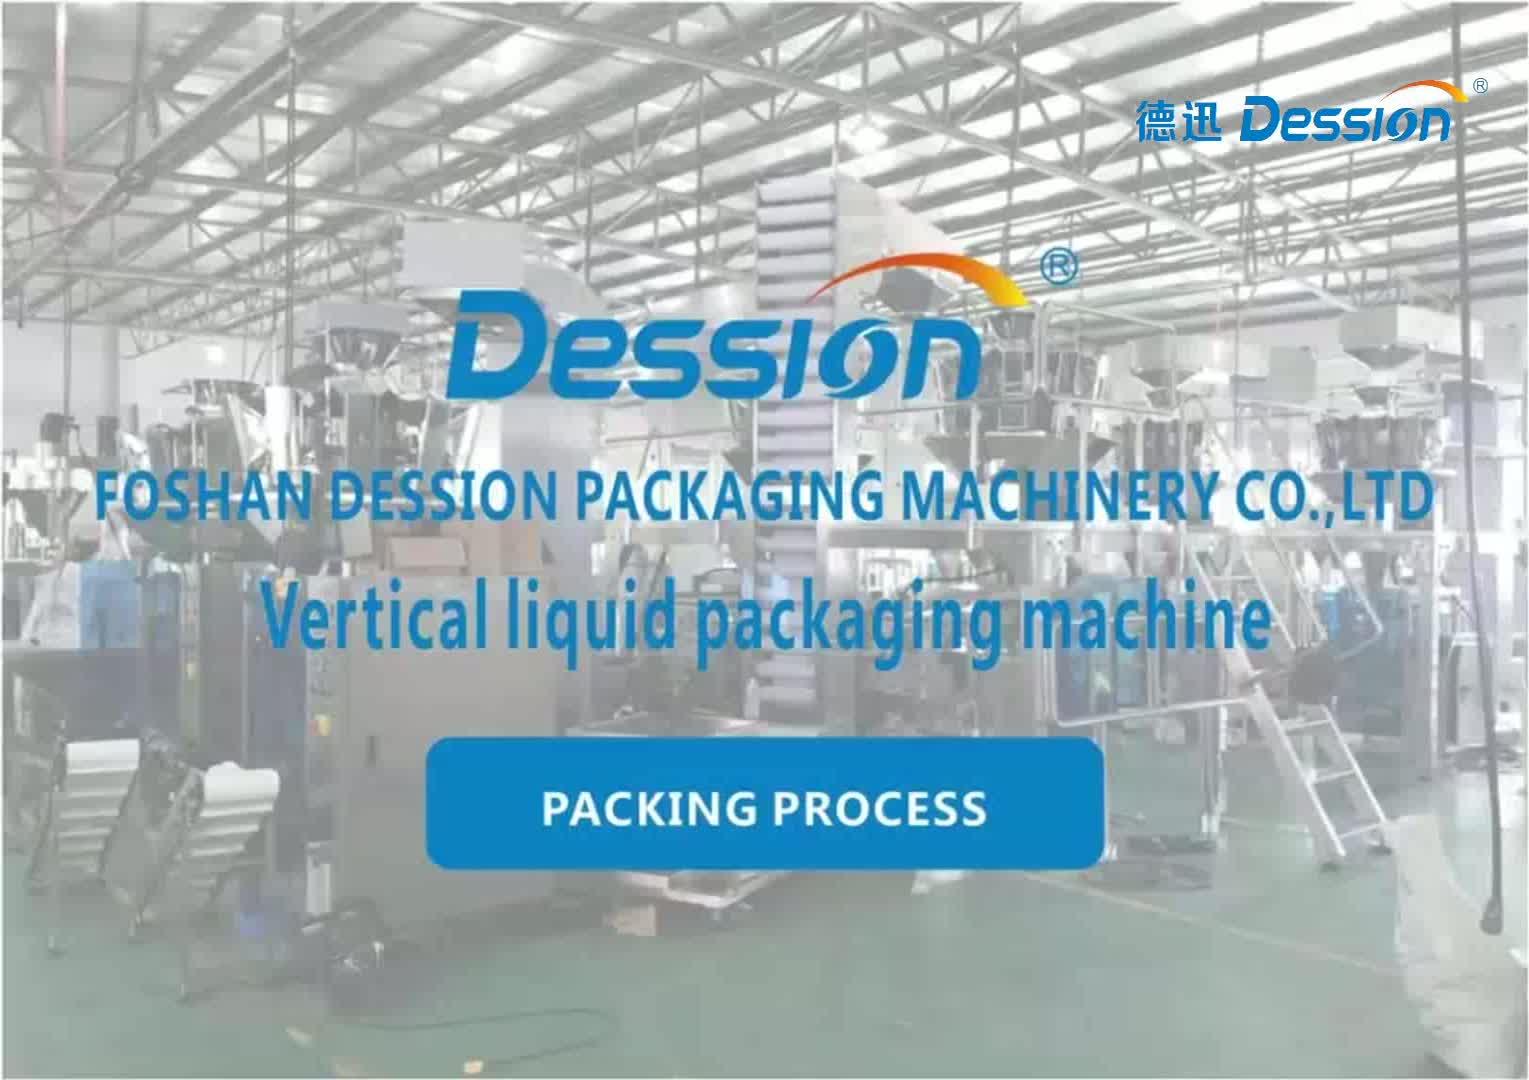 Mesin Kemasan Cair Otomatis Vertikal Sachet Kecil/Mesin Pengemas Cair Sampo